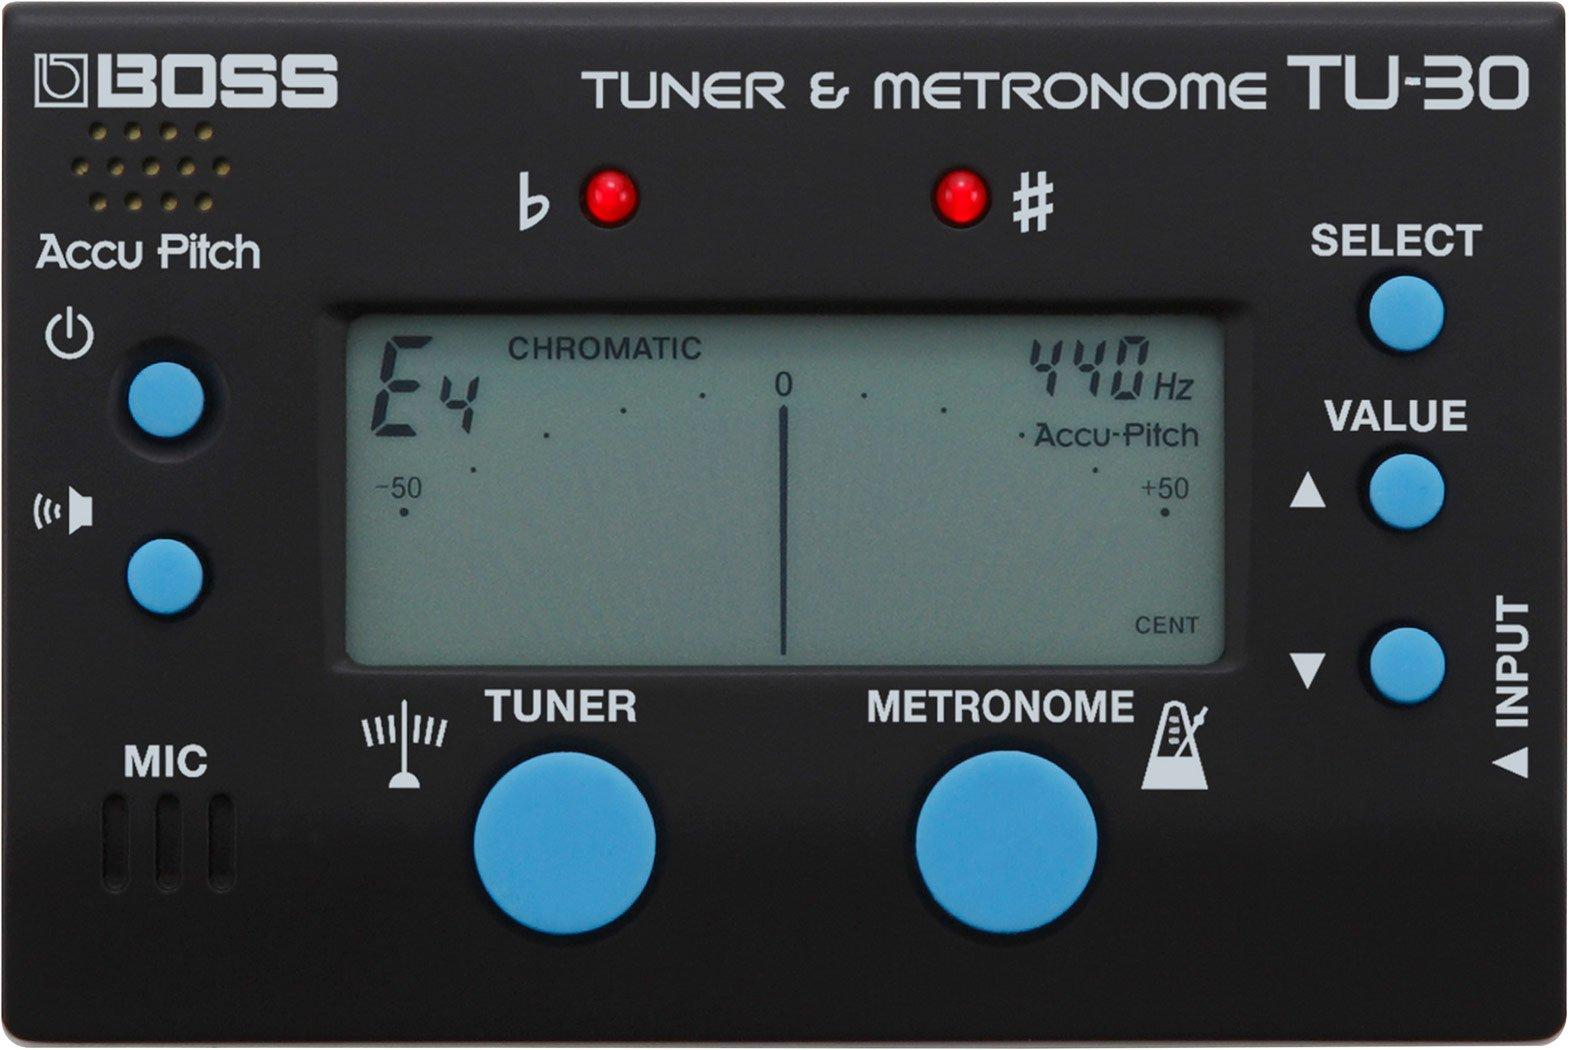 Boss TU-30 Tuner & Metronome Combo